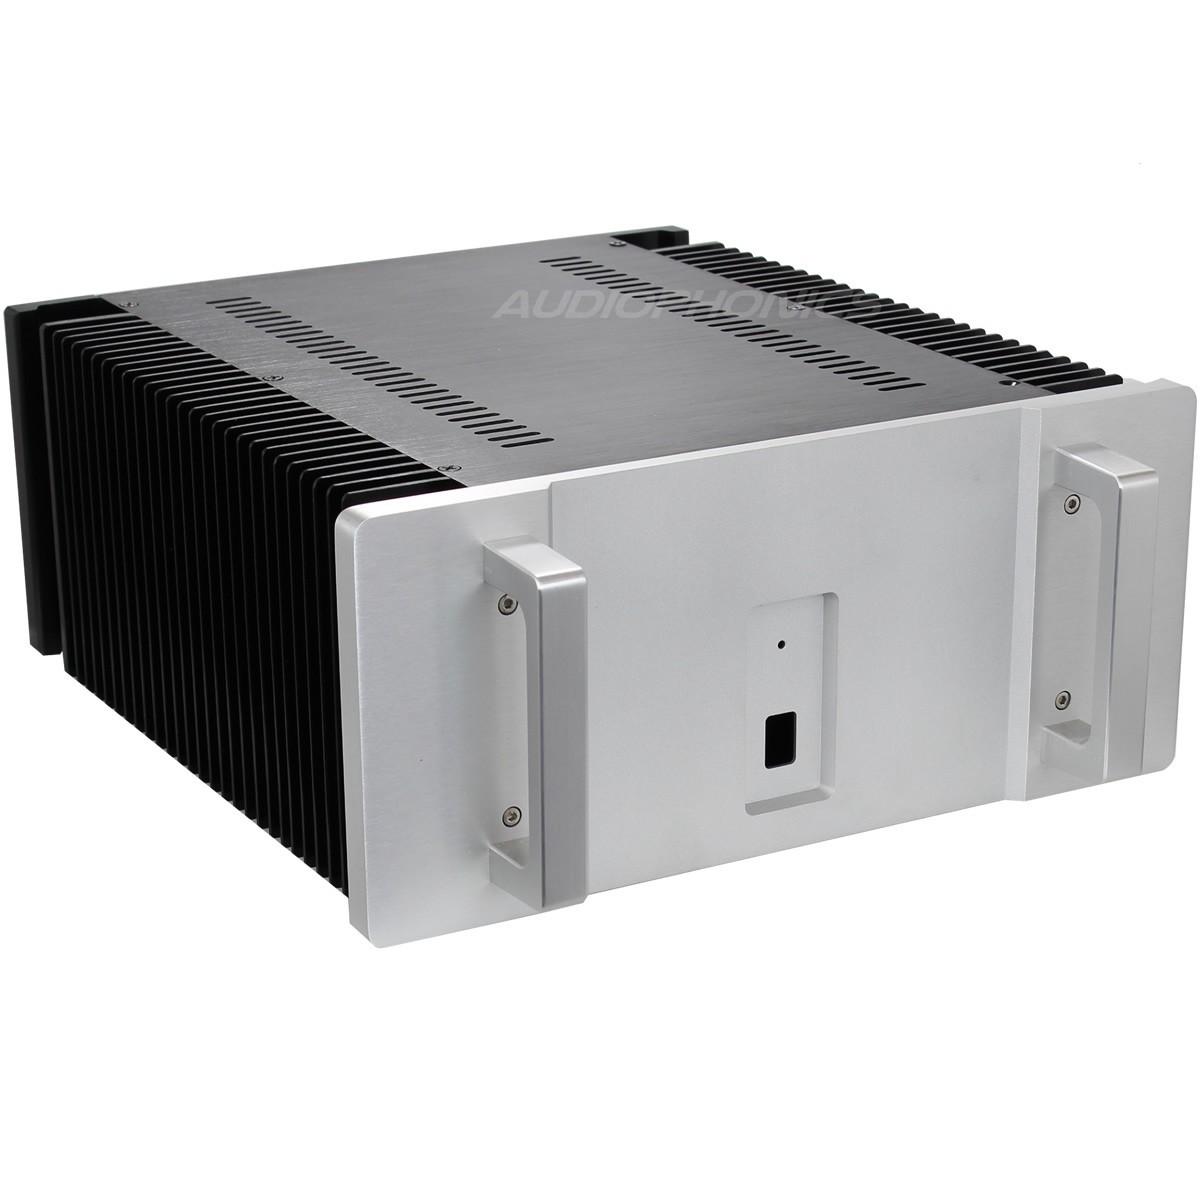 Boitier DIY Amplificateur de puissance 100% Aluminium 361x274x85mm